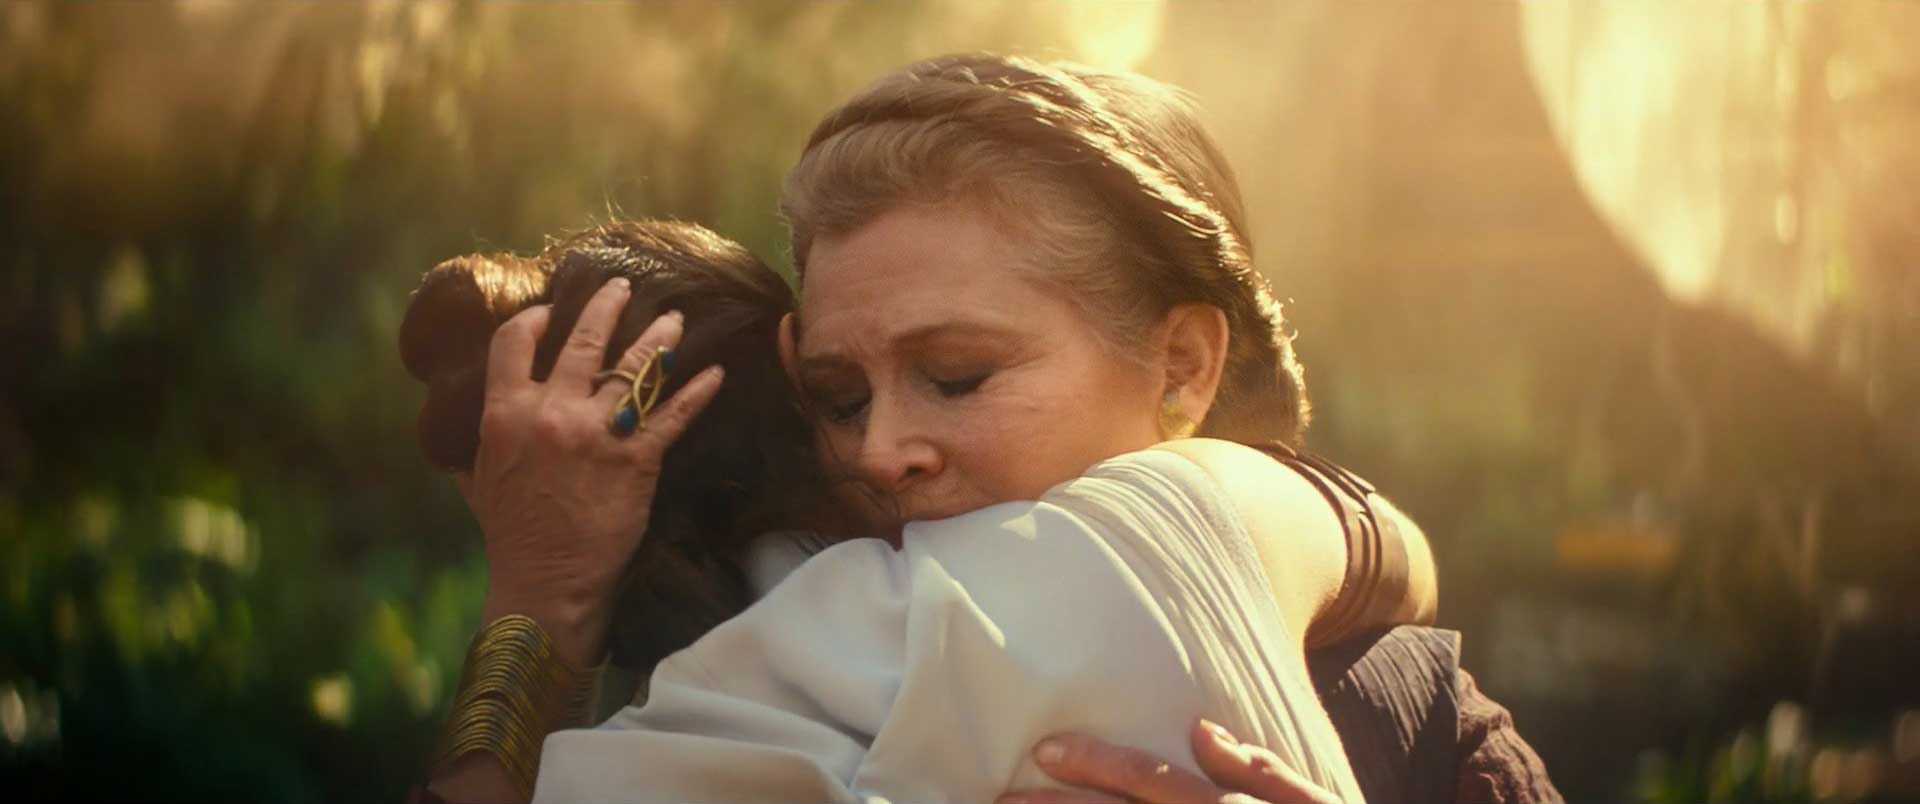 star wars trailer - photo #21